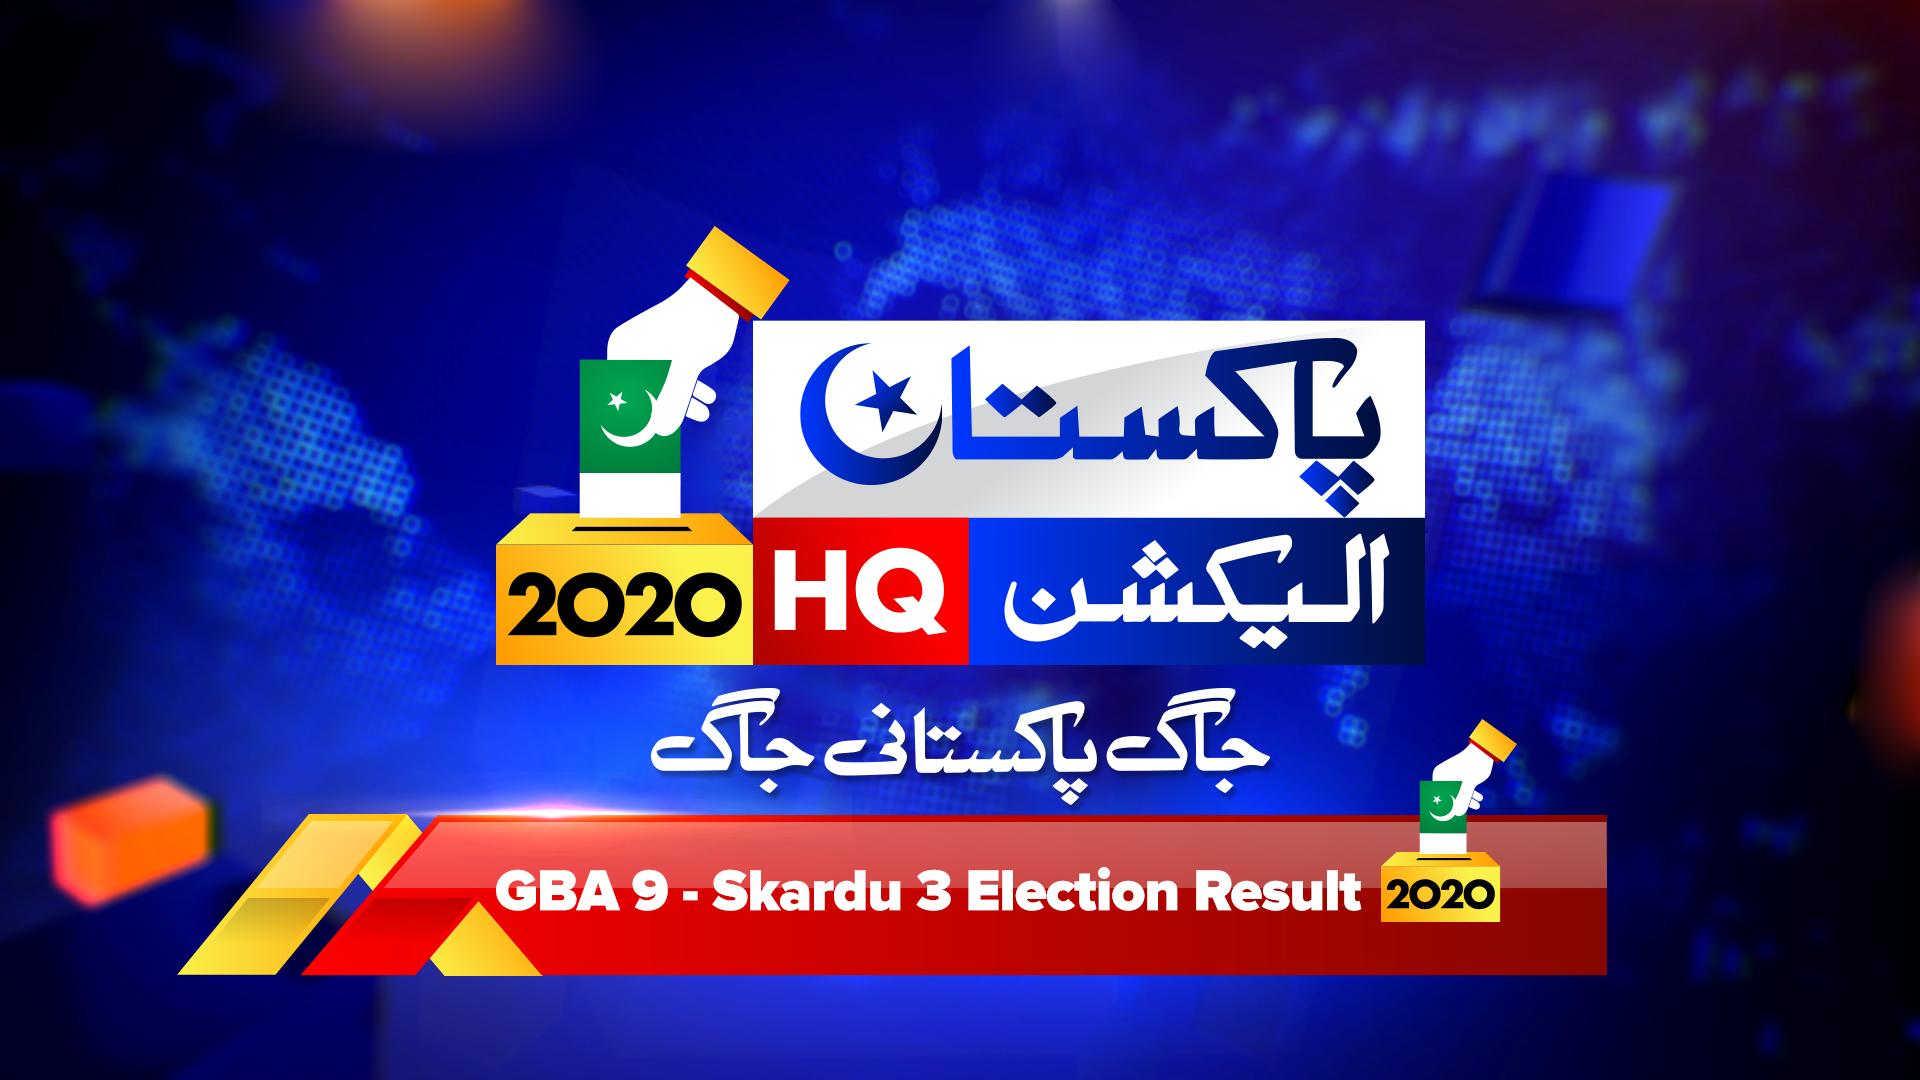 GBA 9 Gilgit 9 Election Result